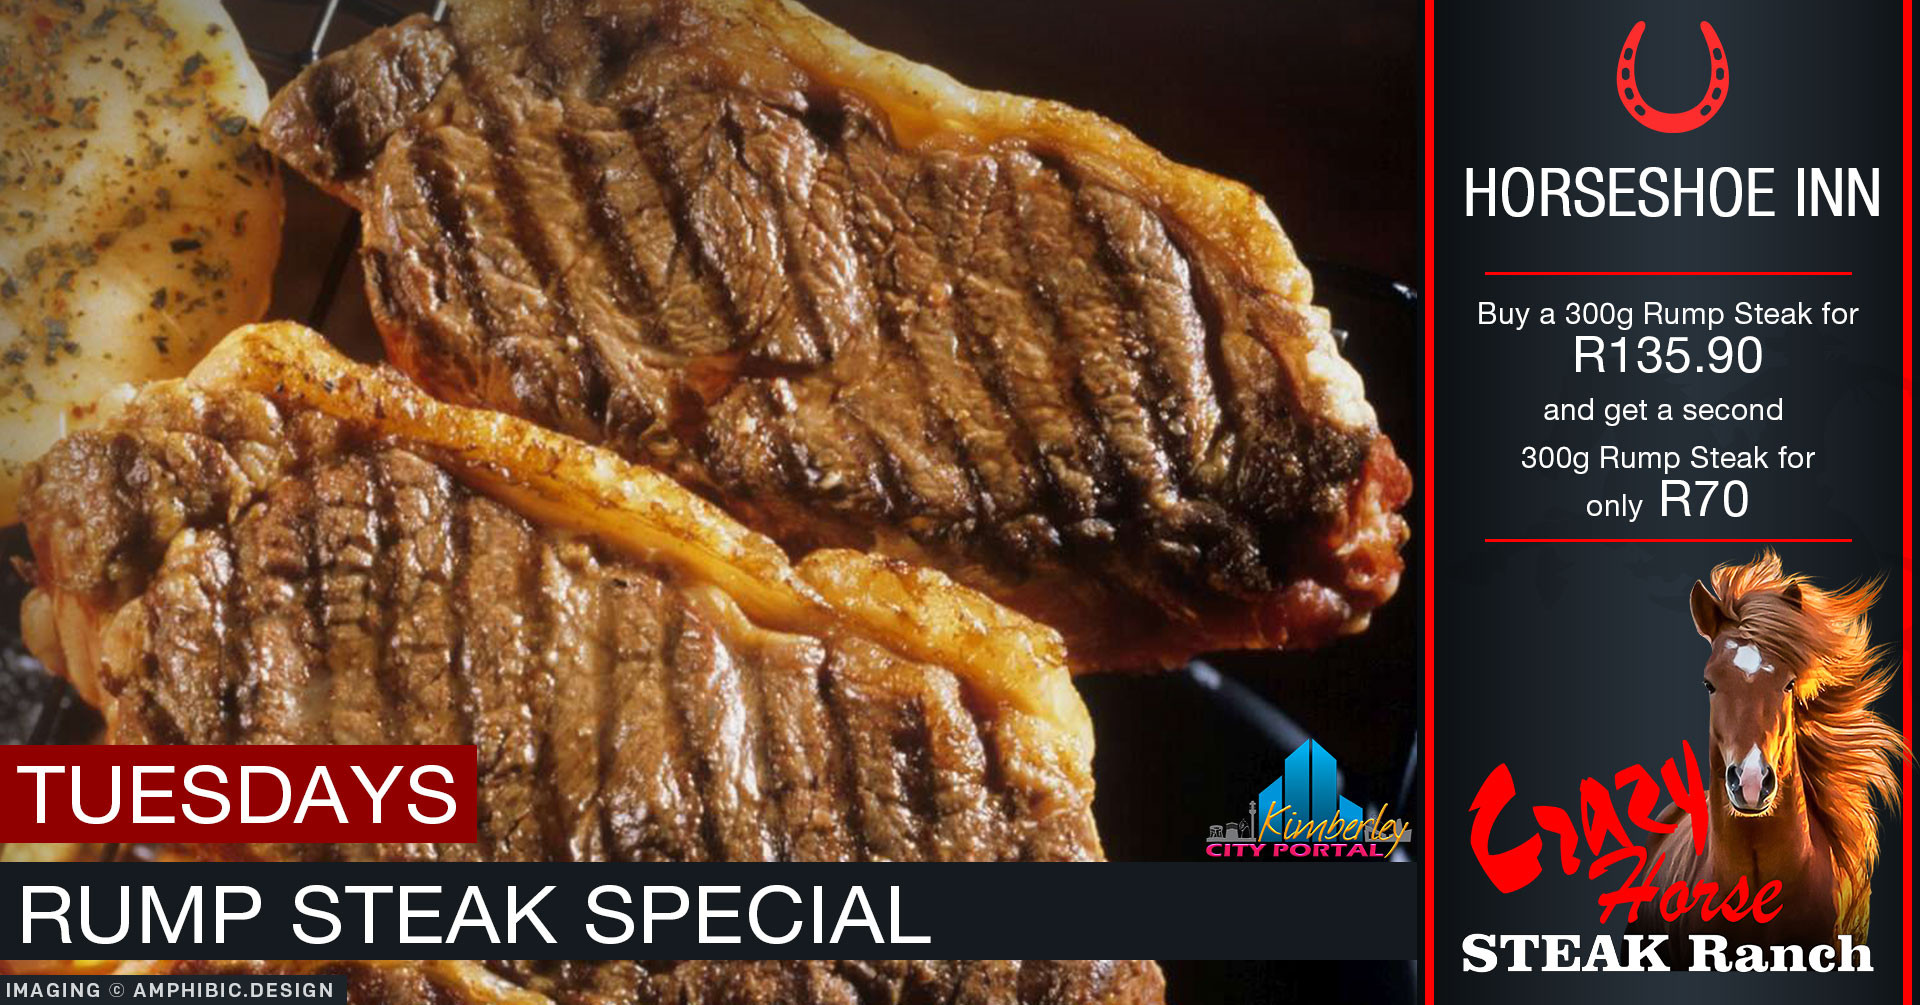 Tuesday Rump Steak Special  The Crazy Horse Steak Ranch ...